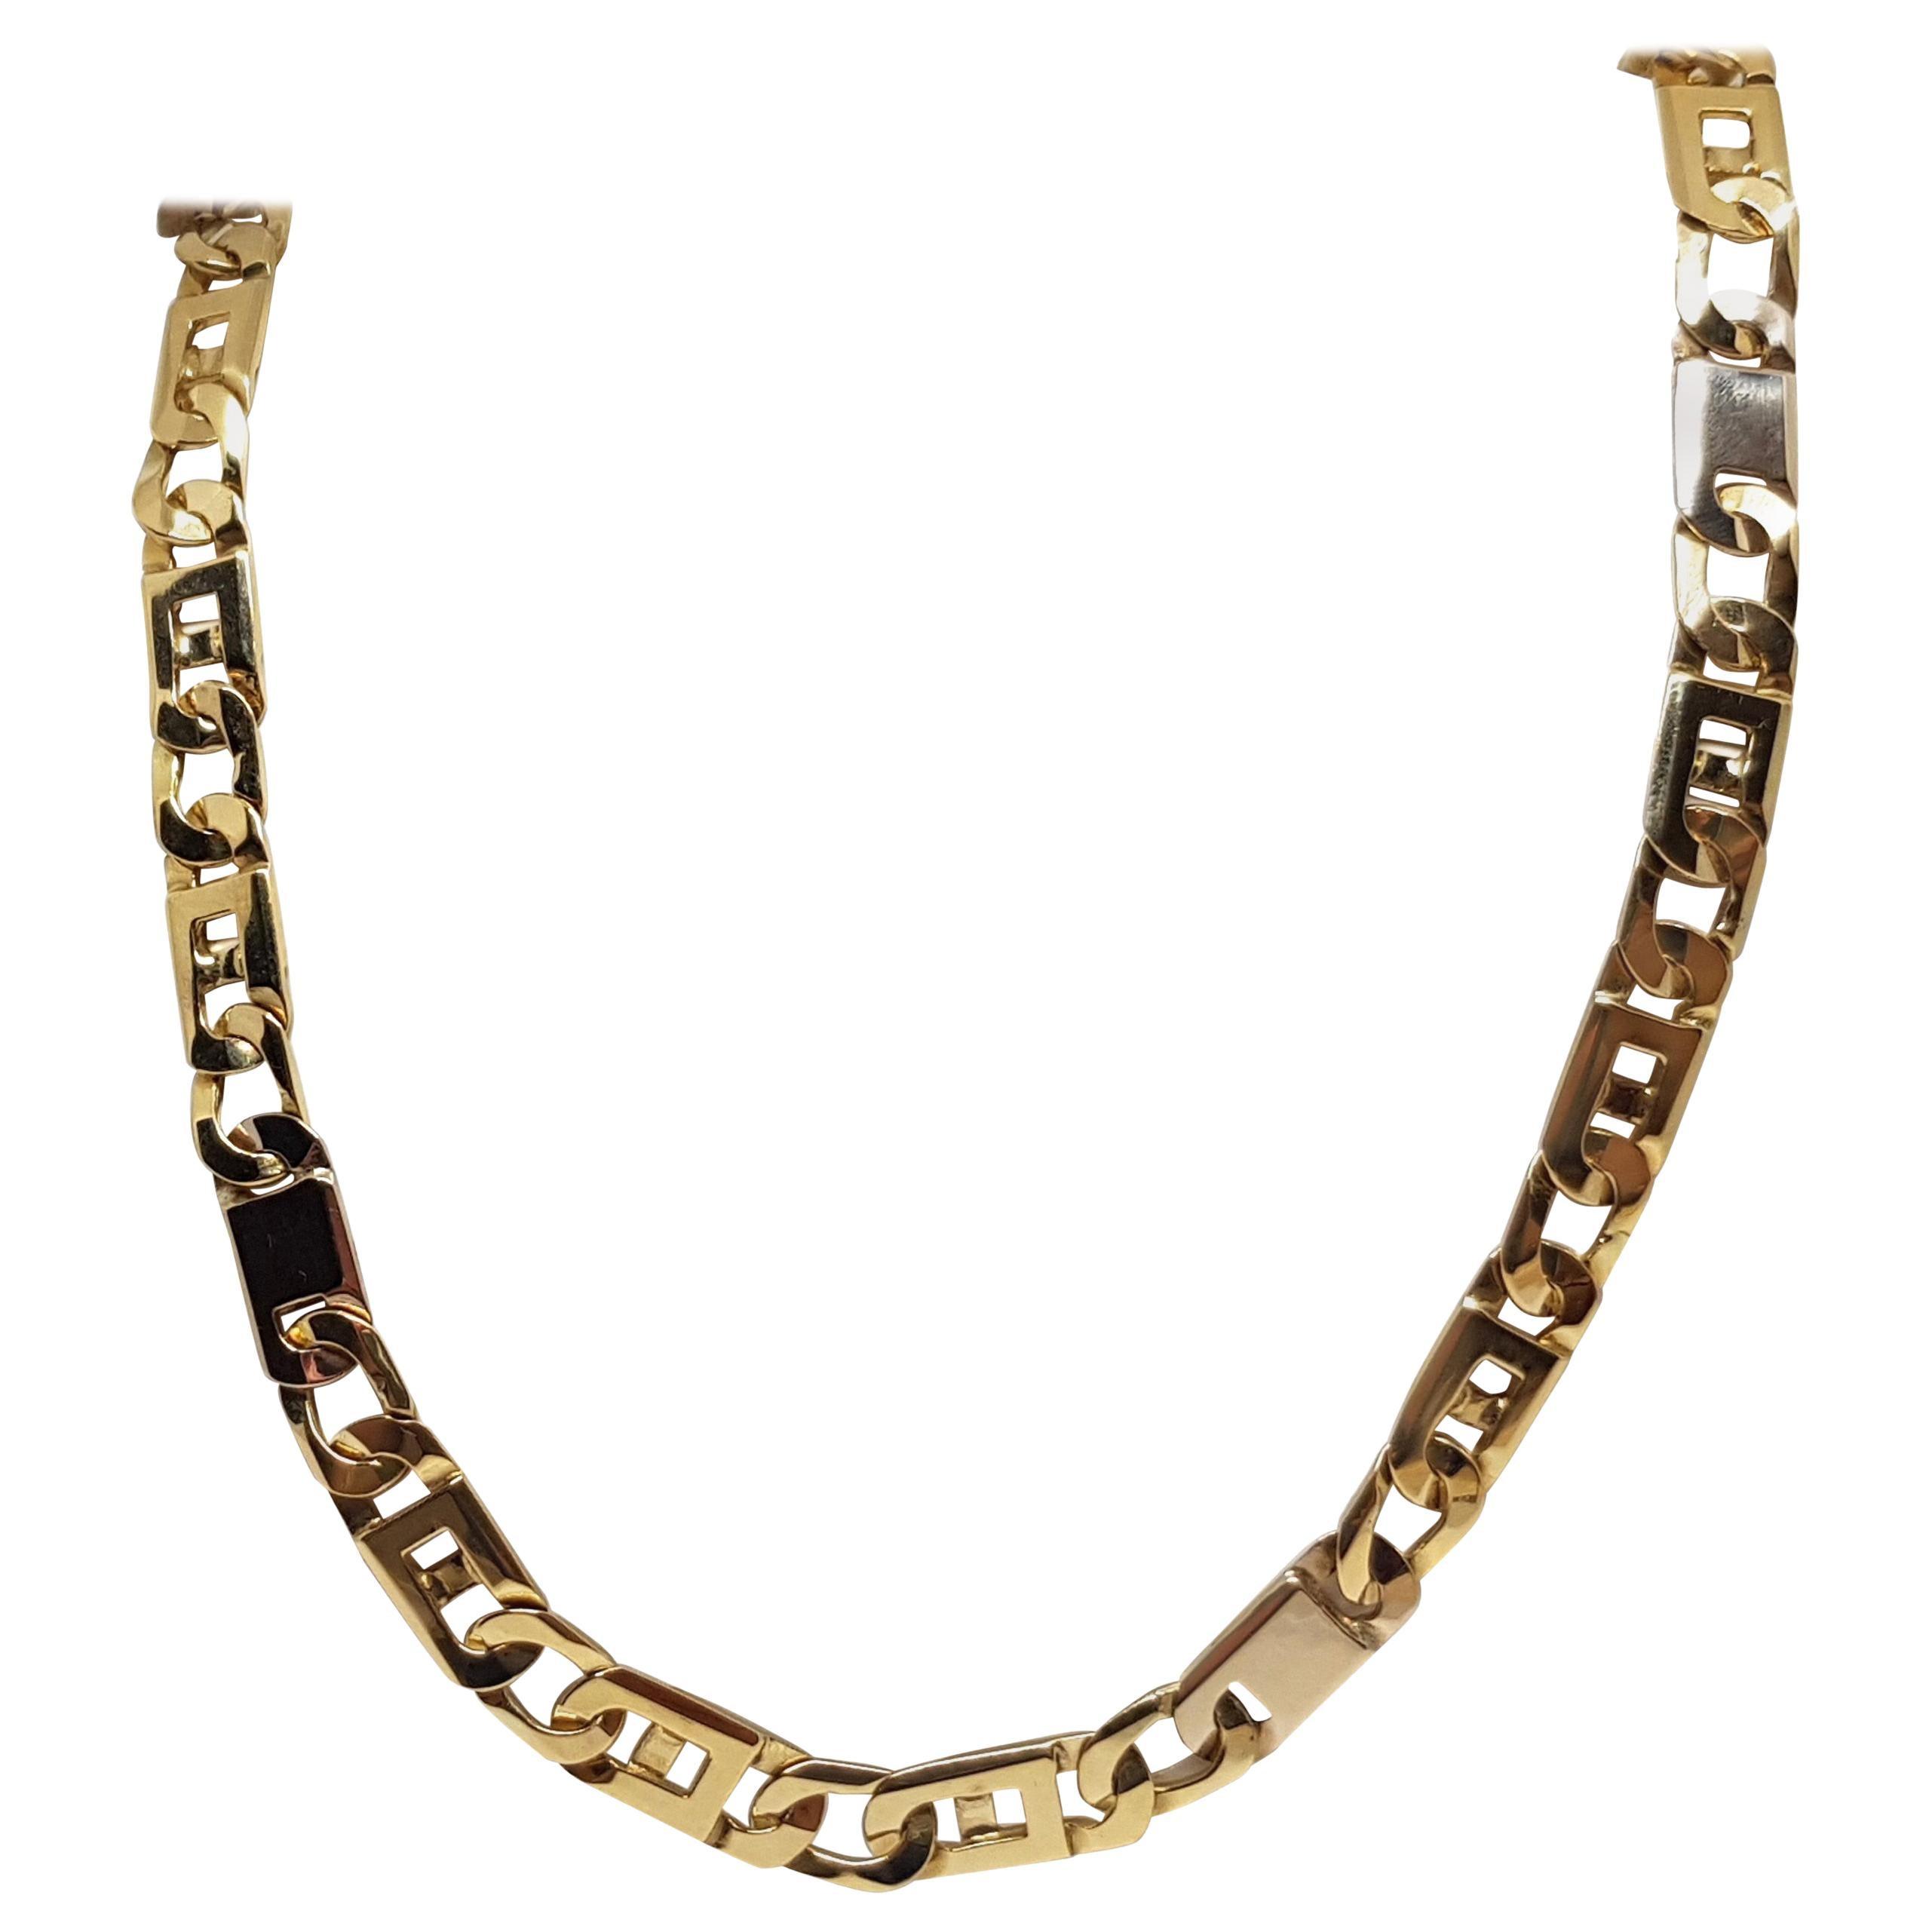 18 Karat Yellow White Gold Men's Chain Necklace